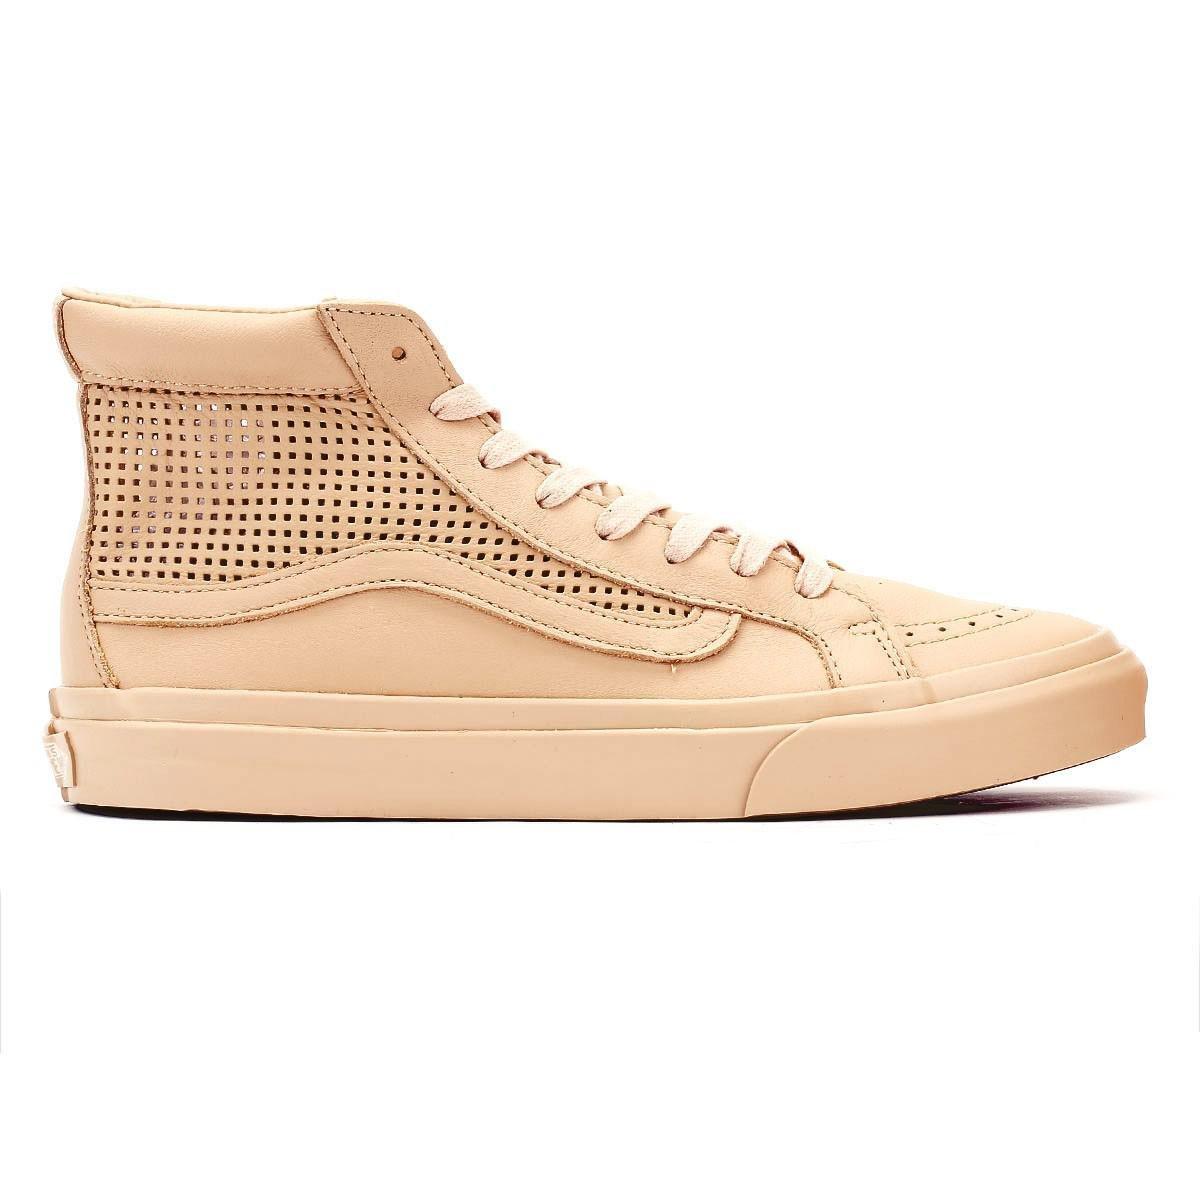 24c0ff980680ca Lyst - Vans Unisex Sk8-hi Slim Cutout Square Perf Dx Sneaker ...